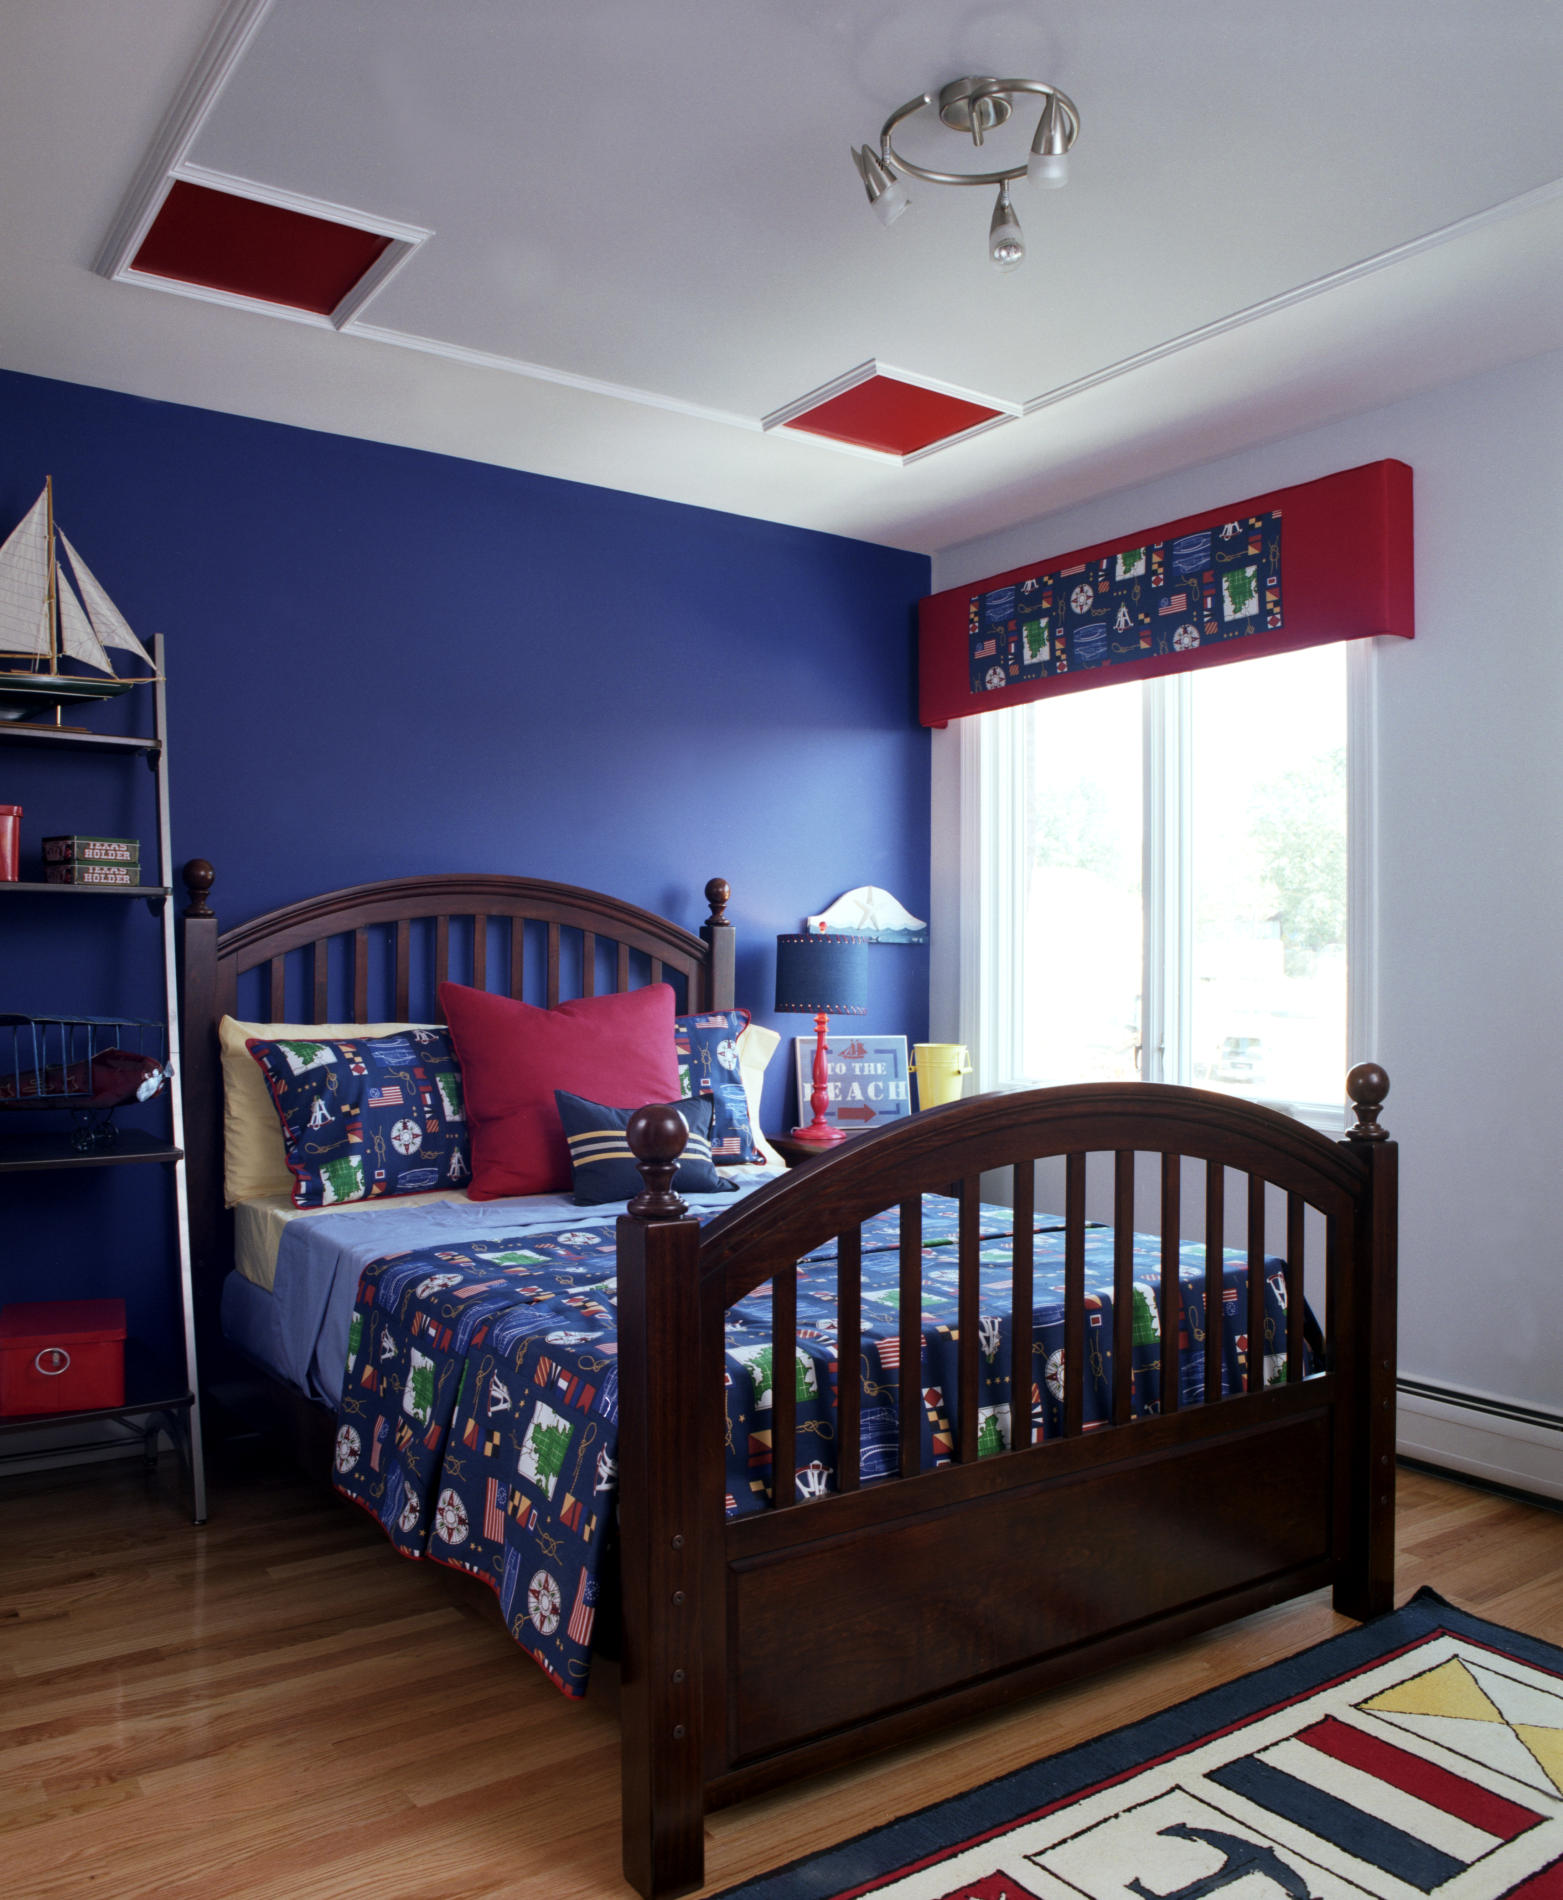 غرف نوم اولاد وشباب مودرن بالوان جديدة 2017 | ميكساتك